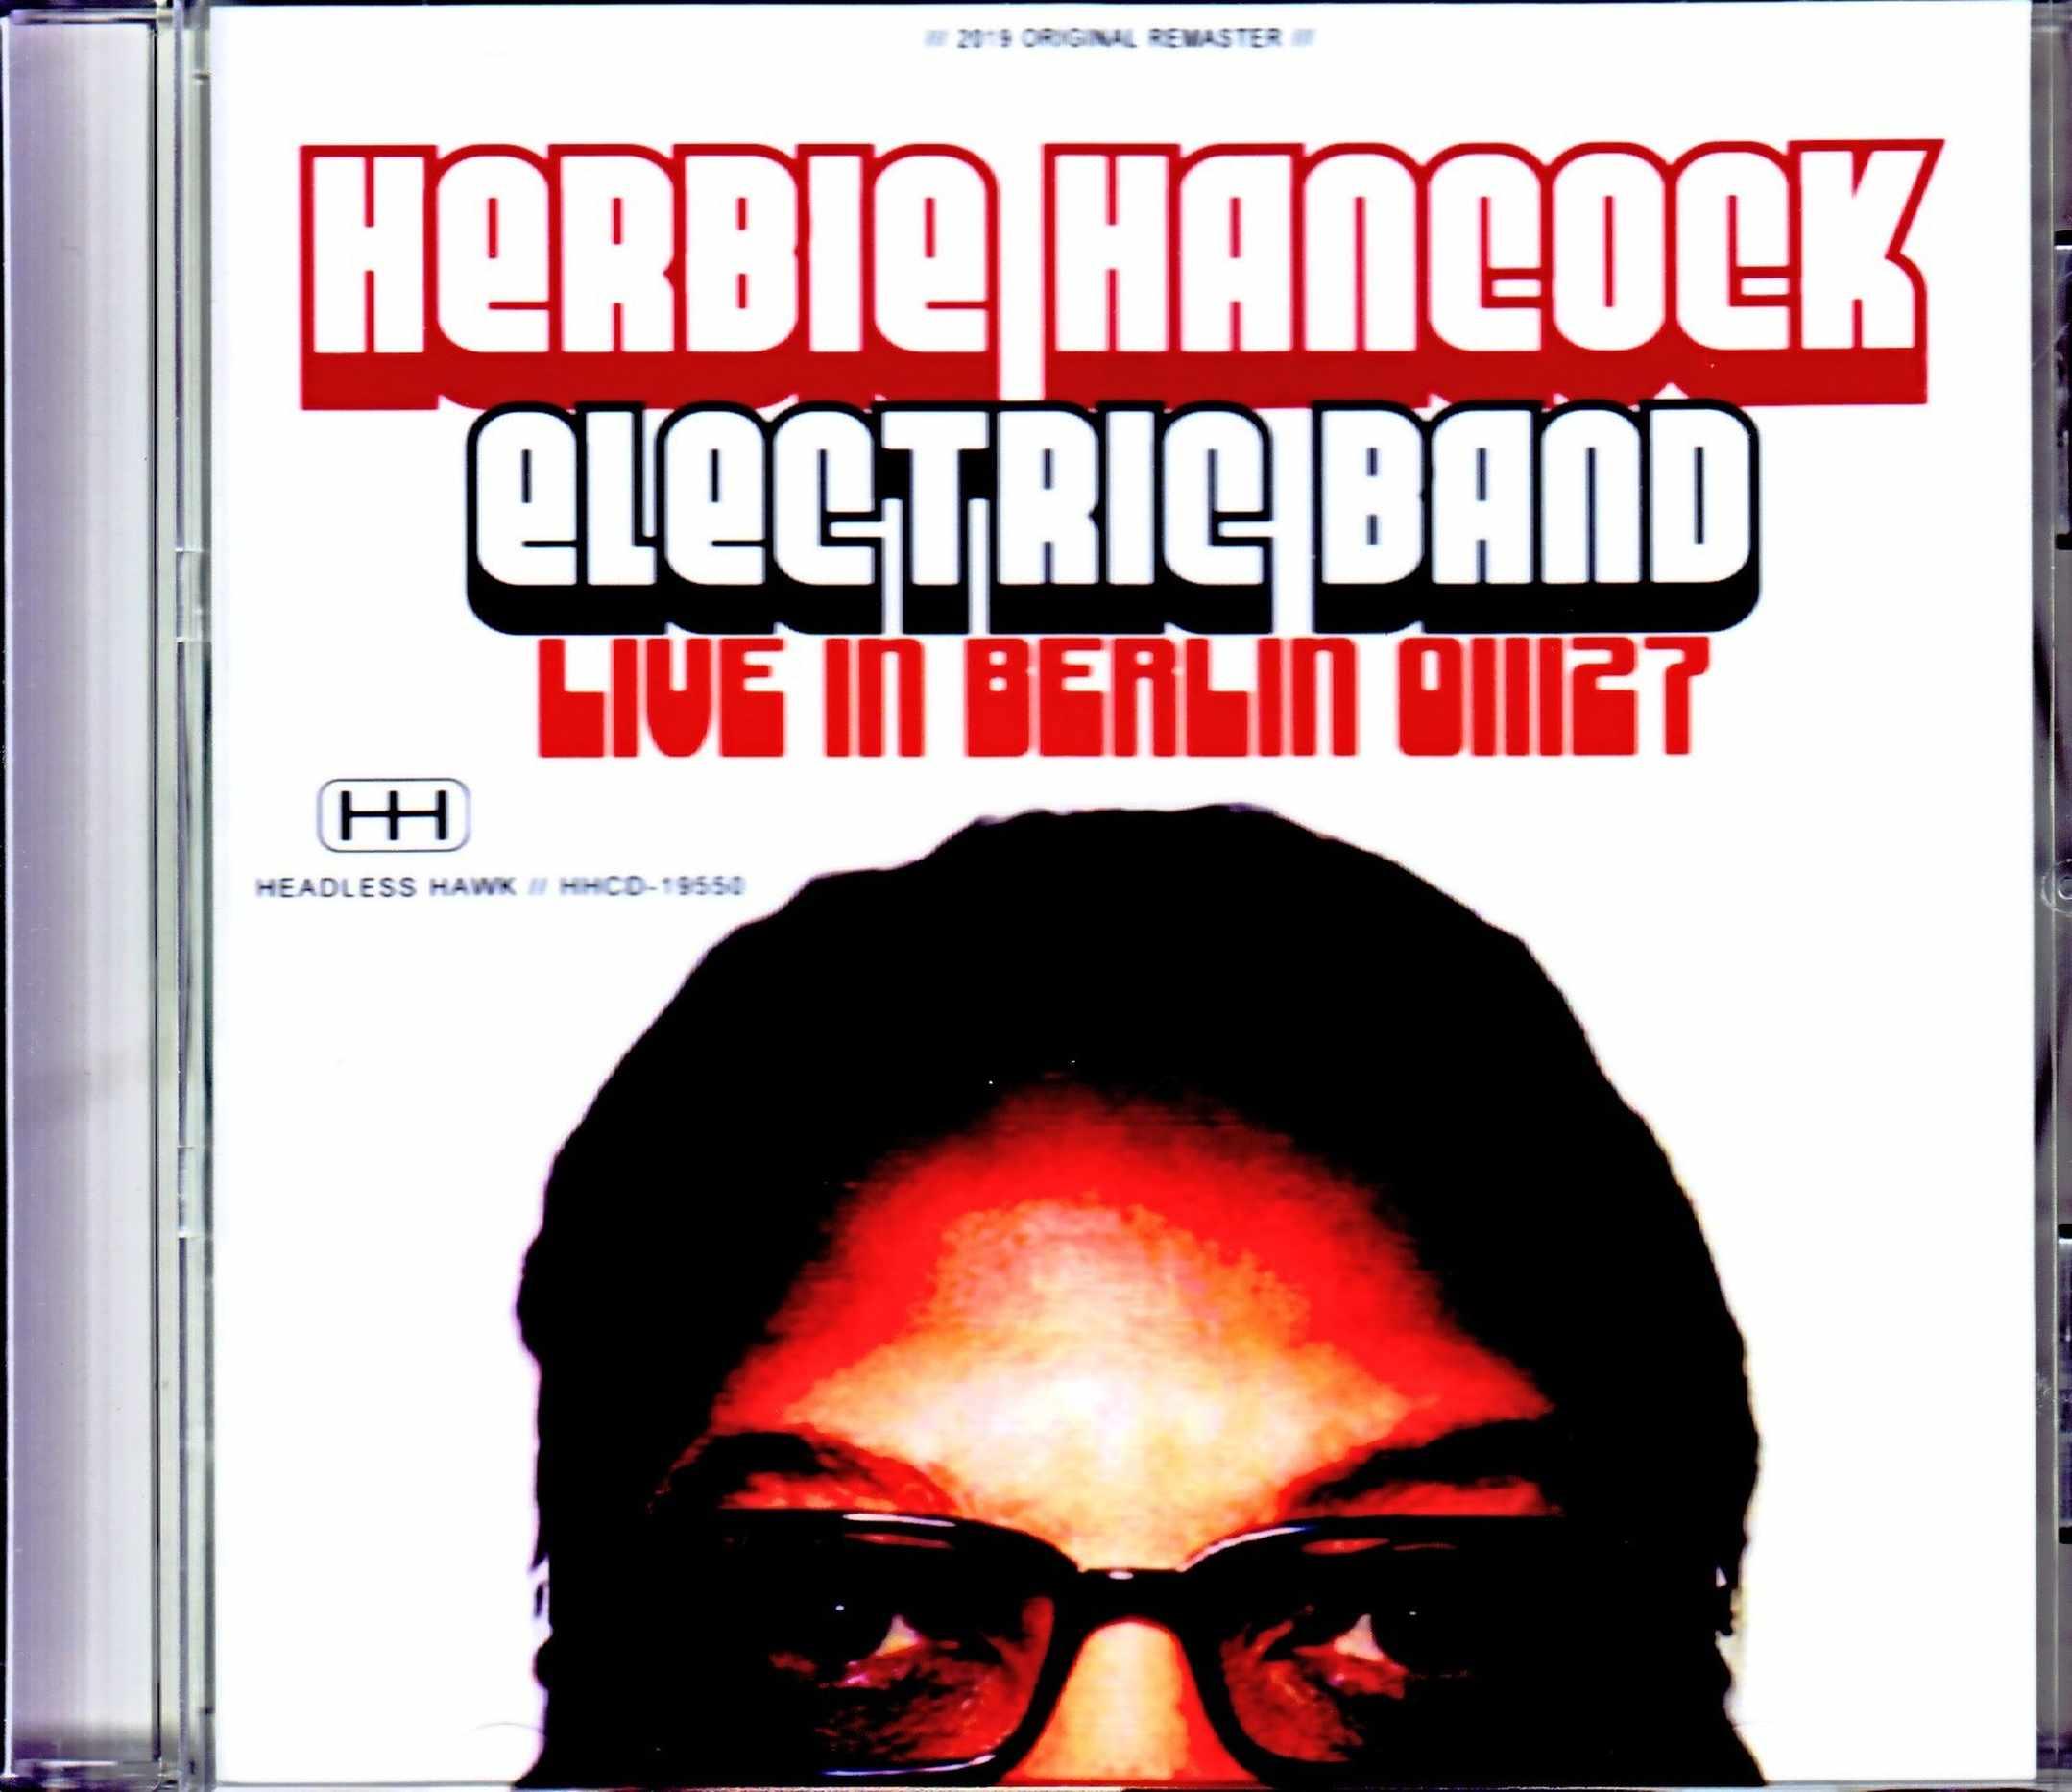 Herbie Hancock  Electric Band ハービー・ハンコック/Germany 2001